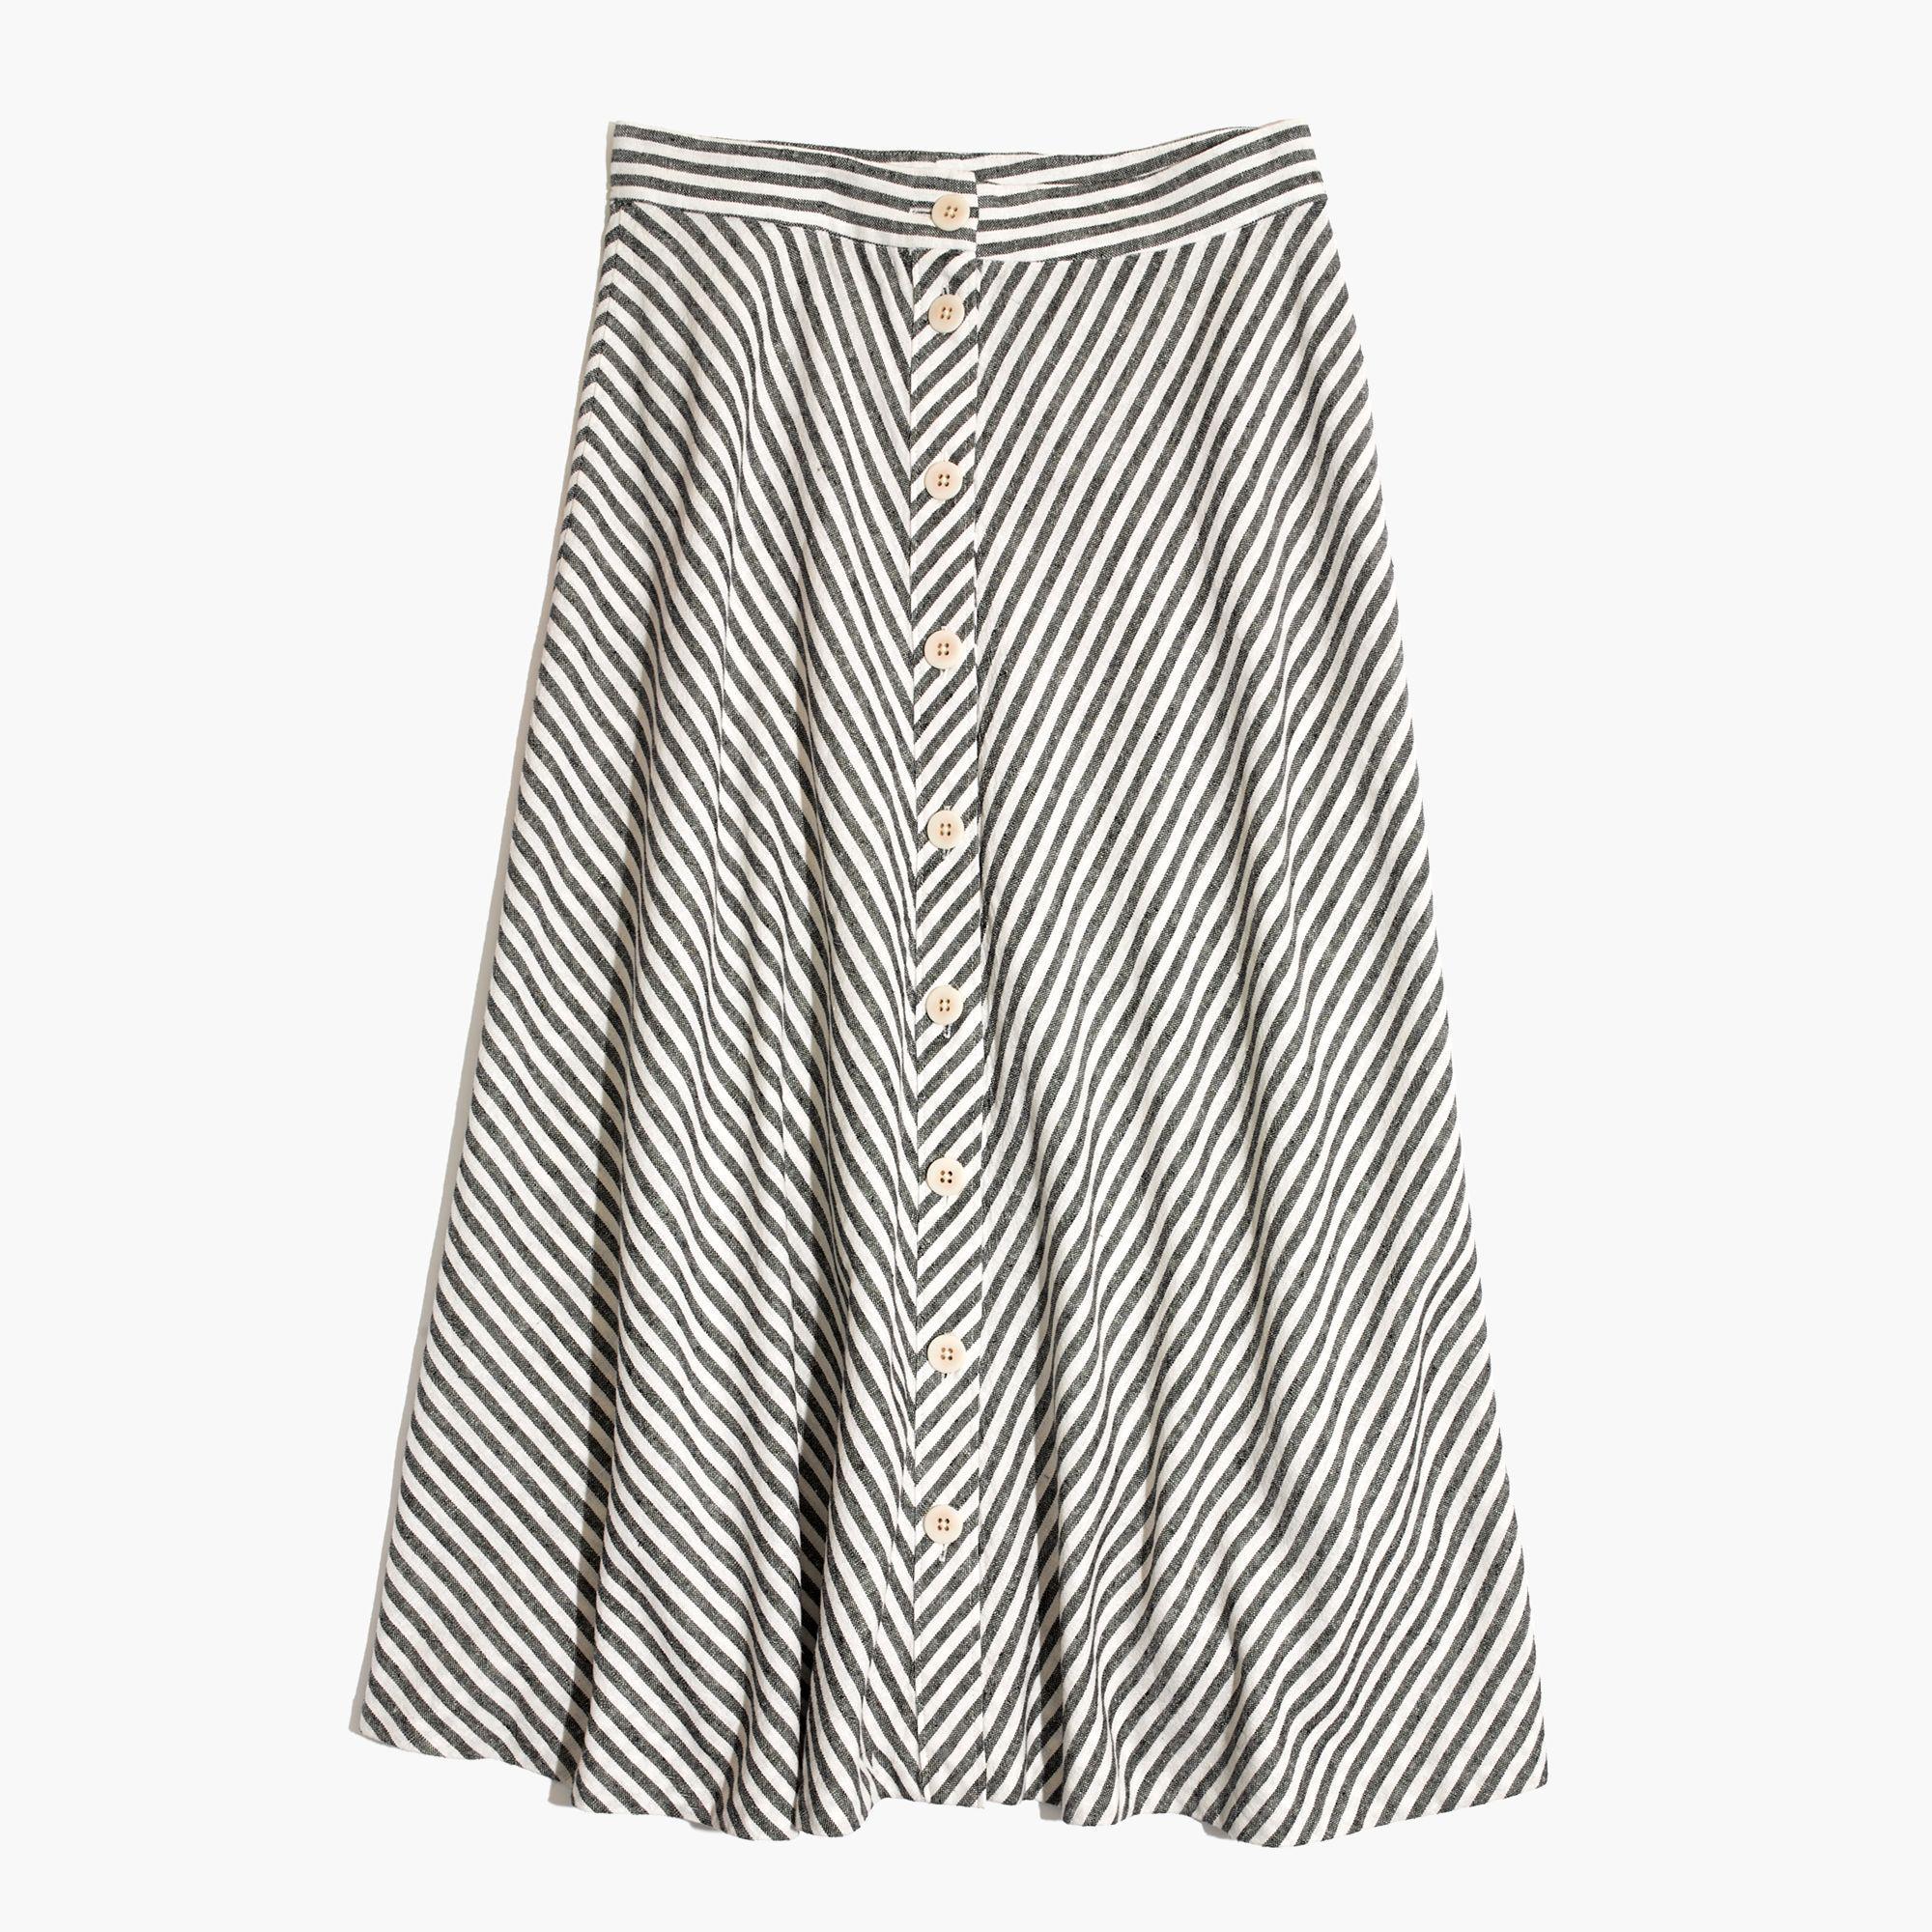 3222a4915360 Madewell Side-button Midi Skirt In Rhoda Stripe - Lyst